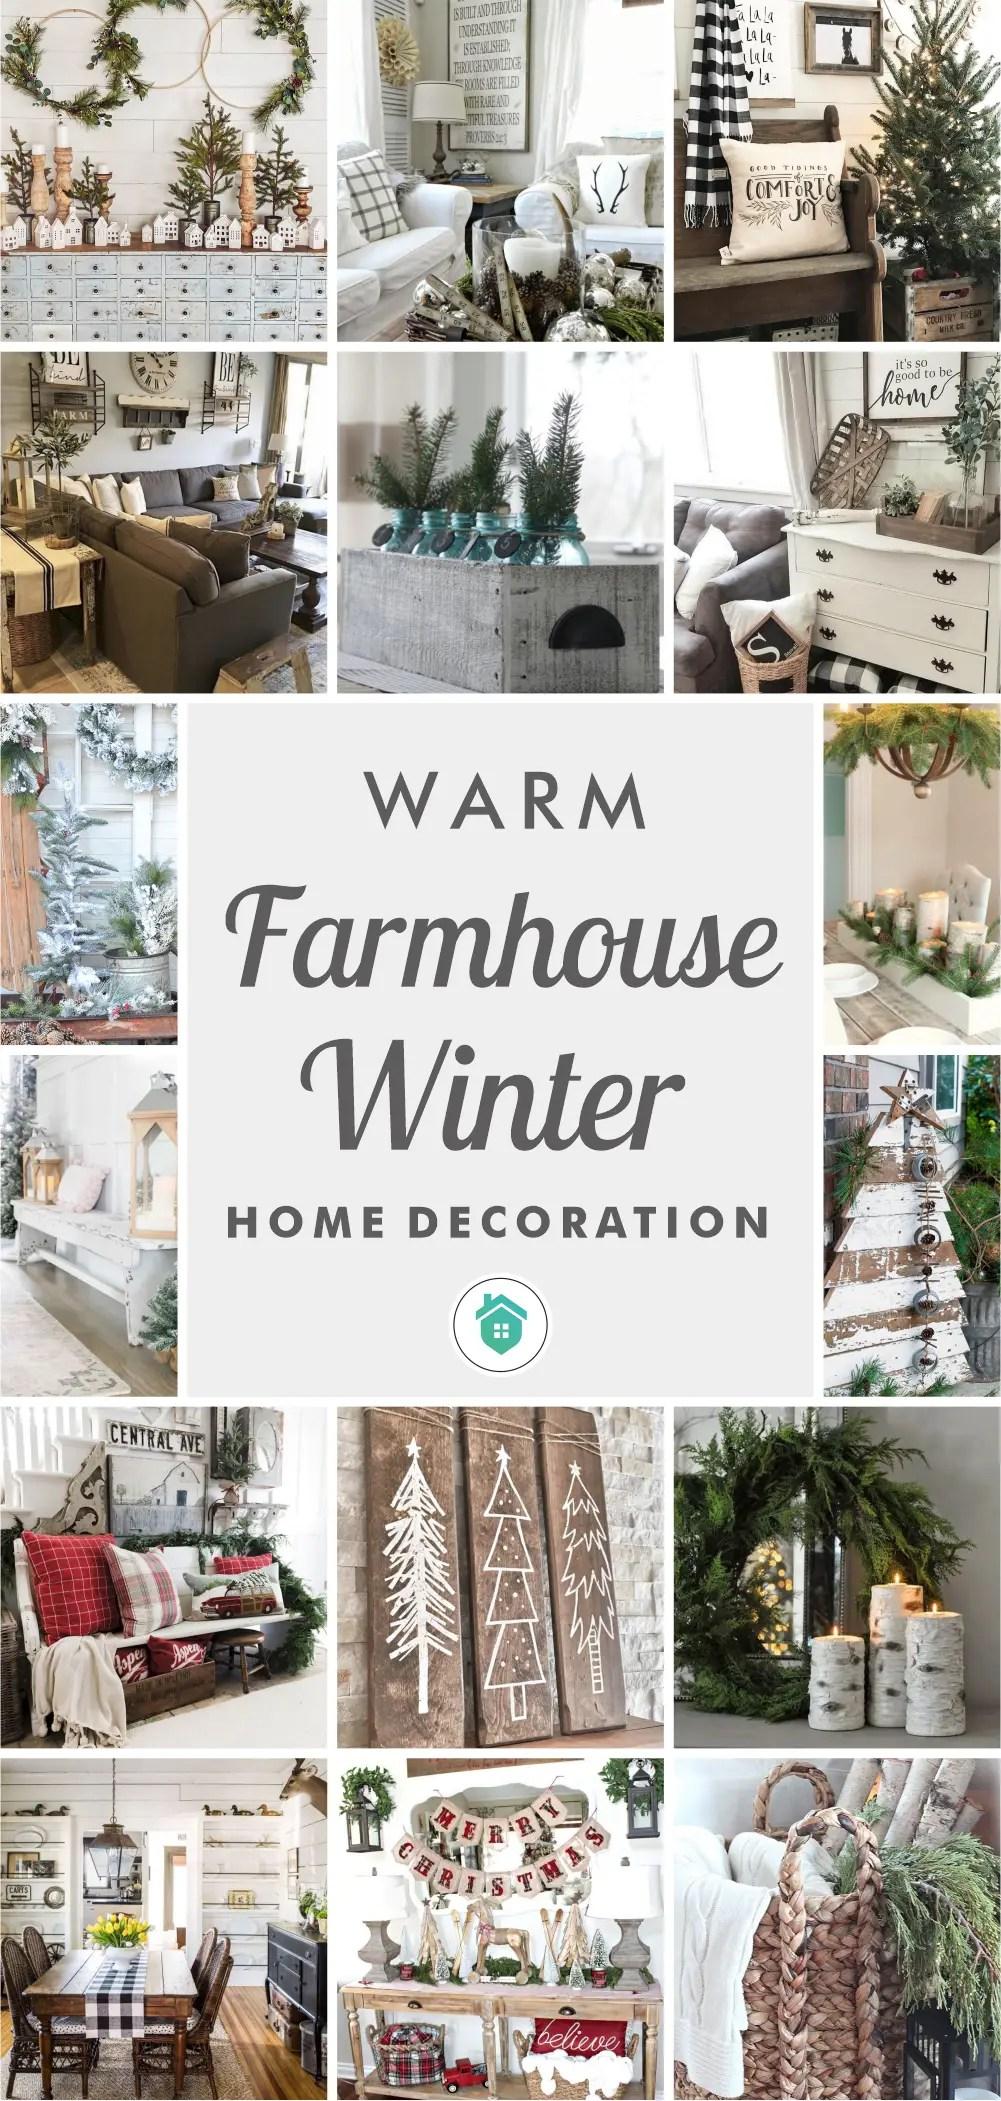 25-warm-farmhouse-winter-home-decoration5